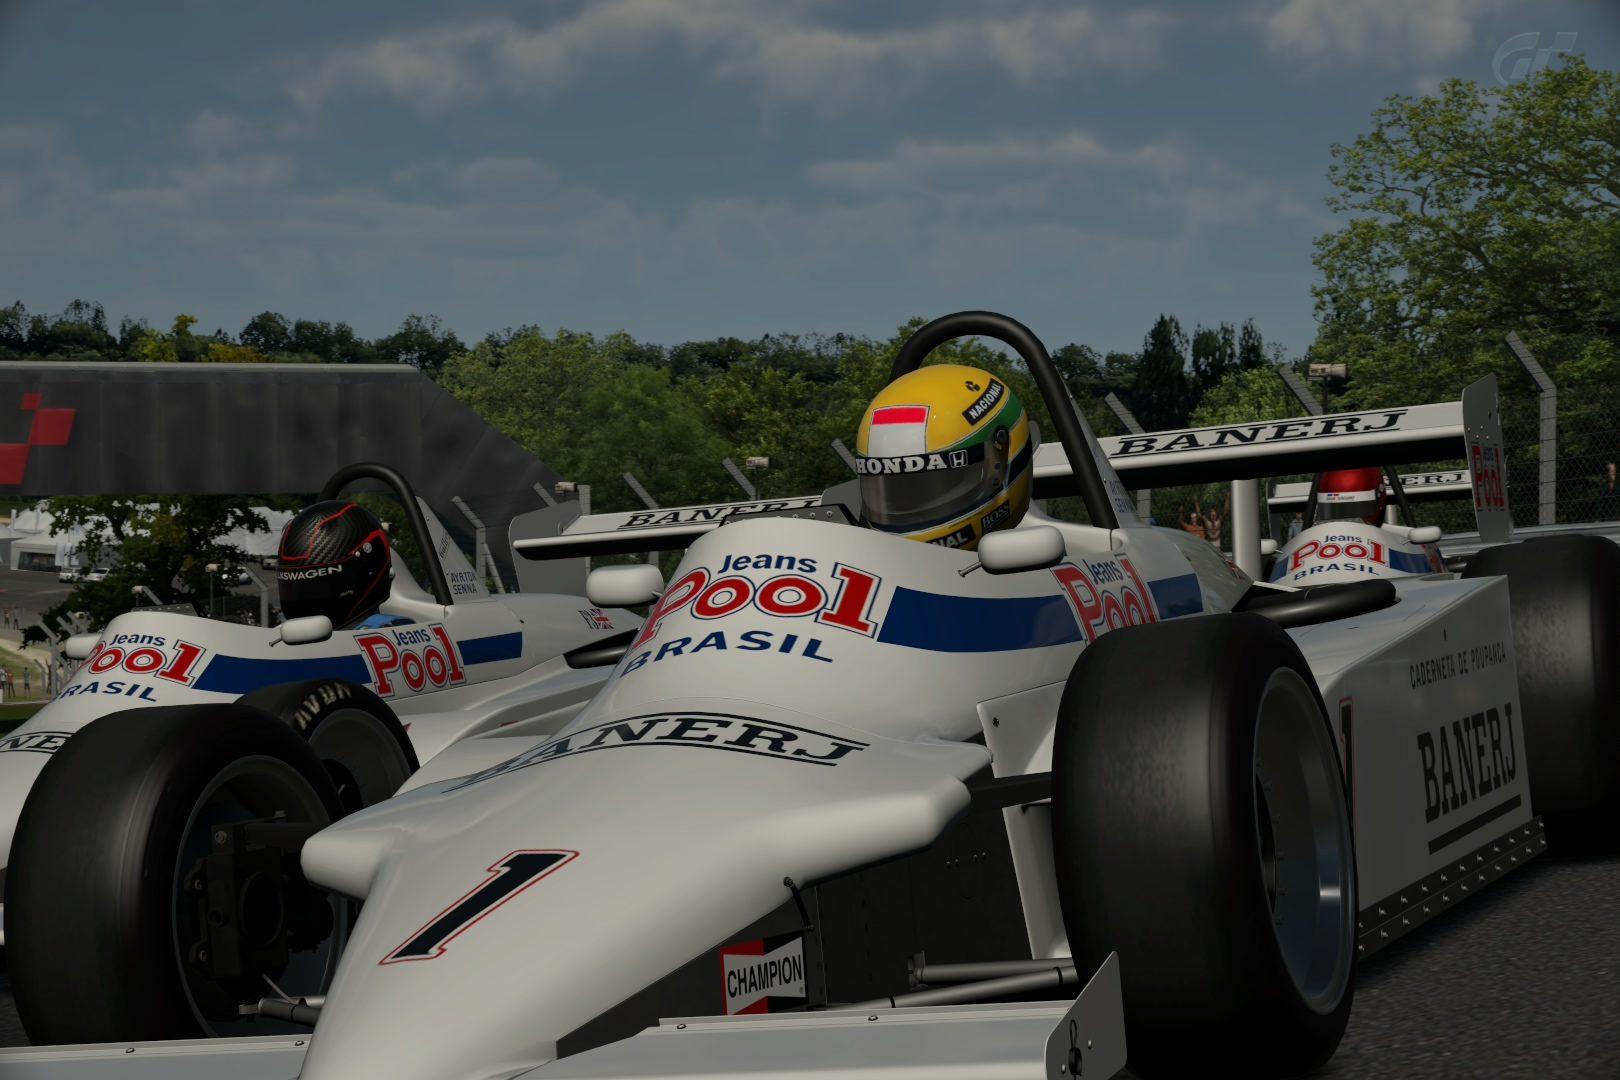 Brands Hatch Grand Prix Circuit '80s_2.jpg